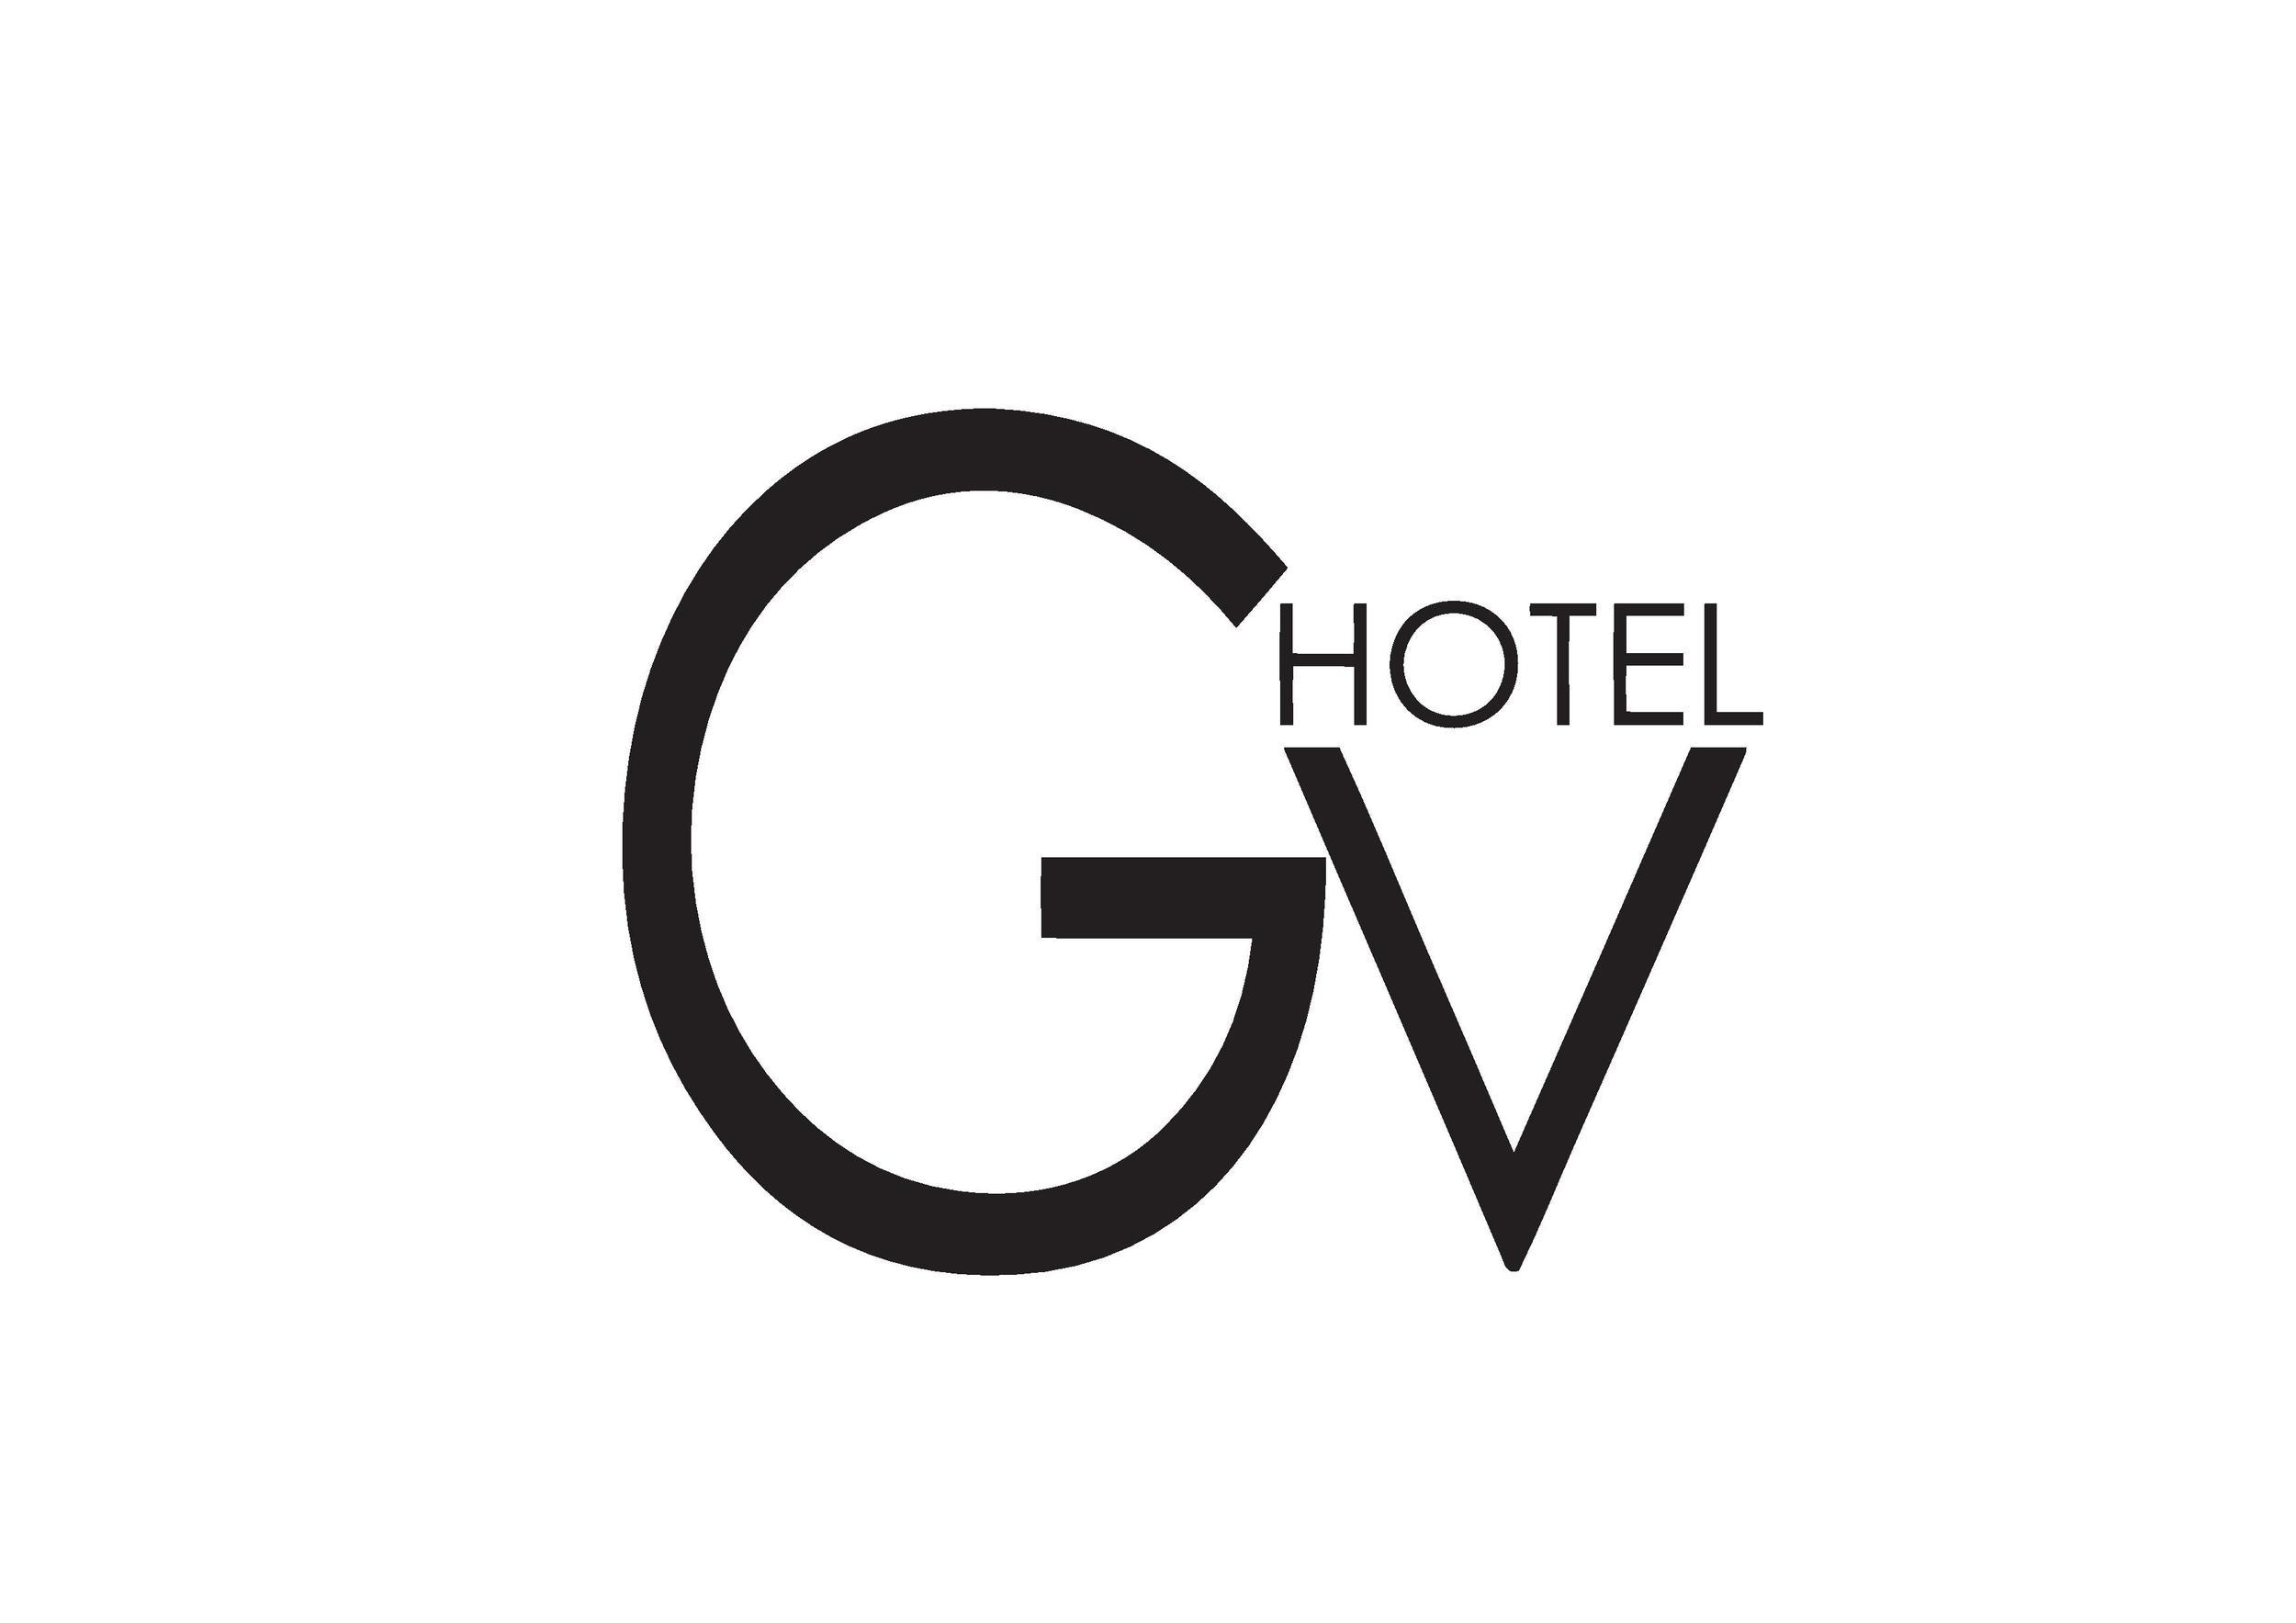 GV Hotel (Black)-page-001.jpg